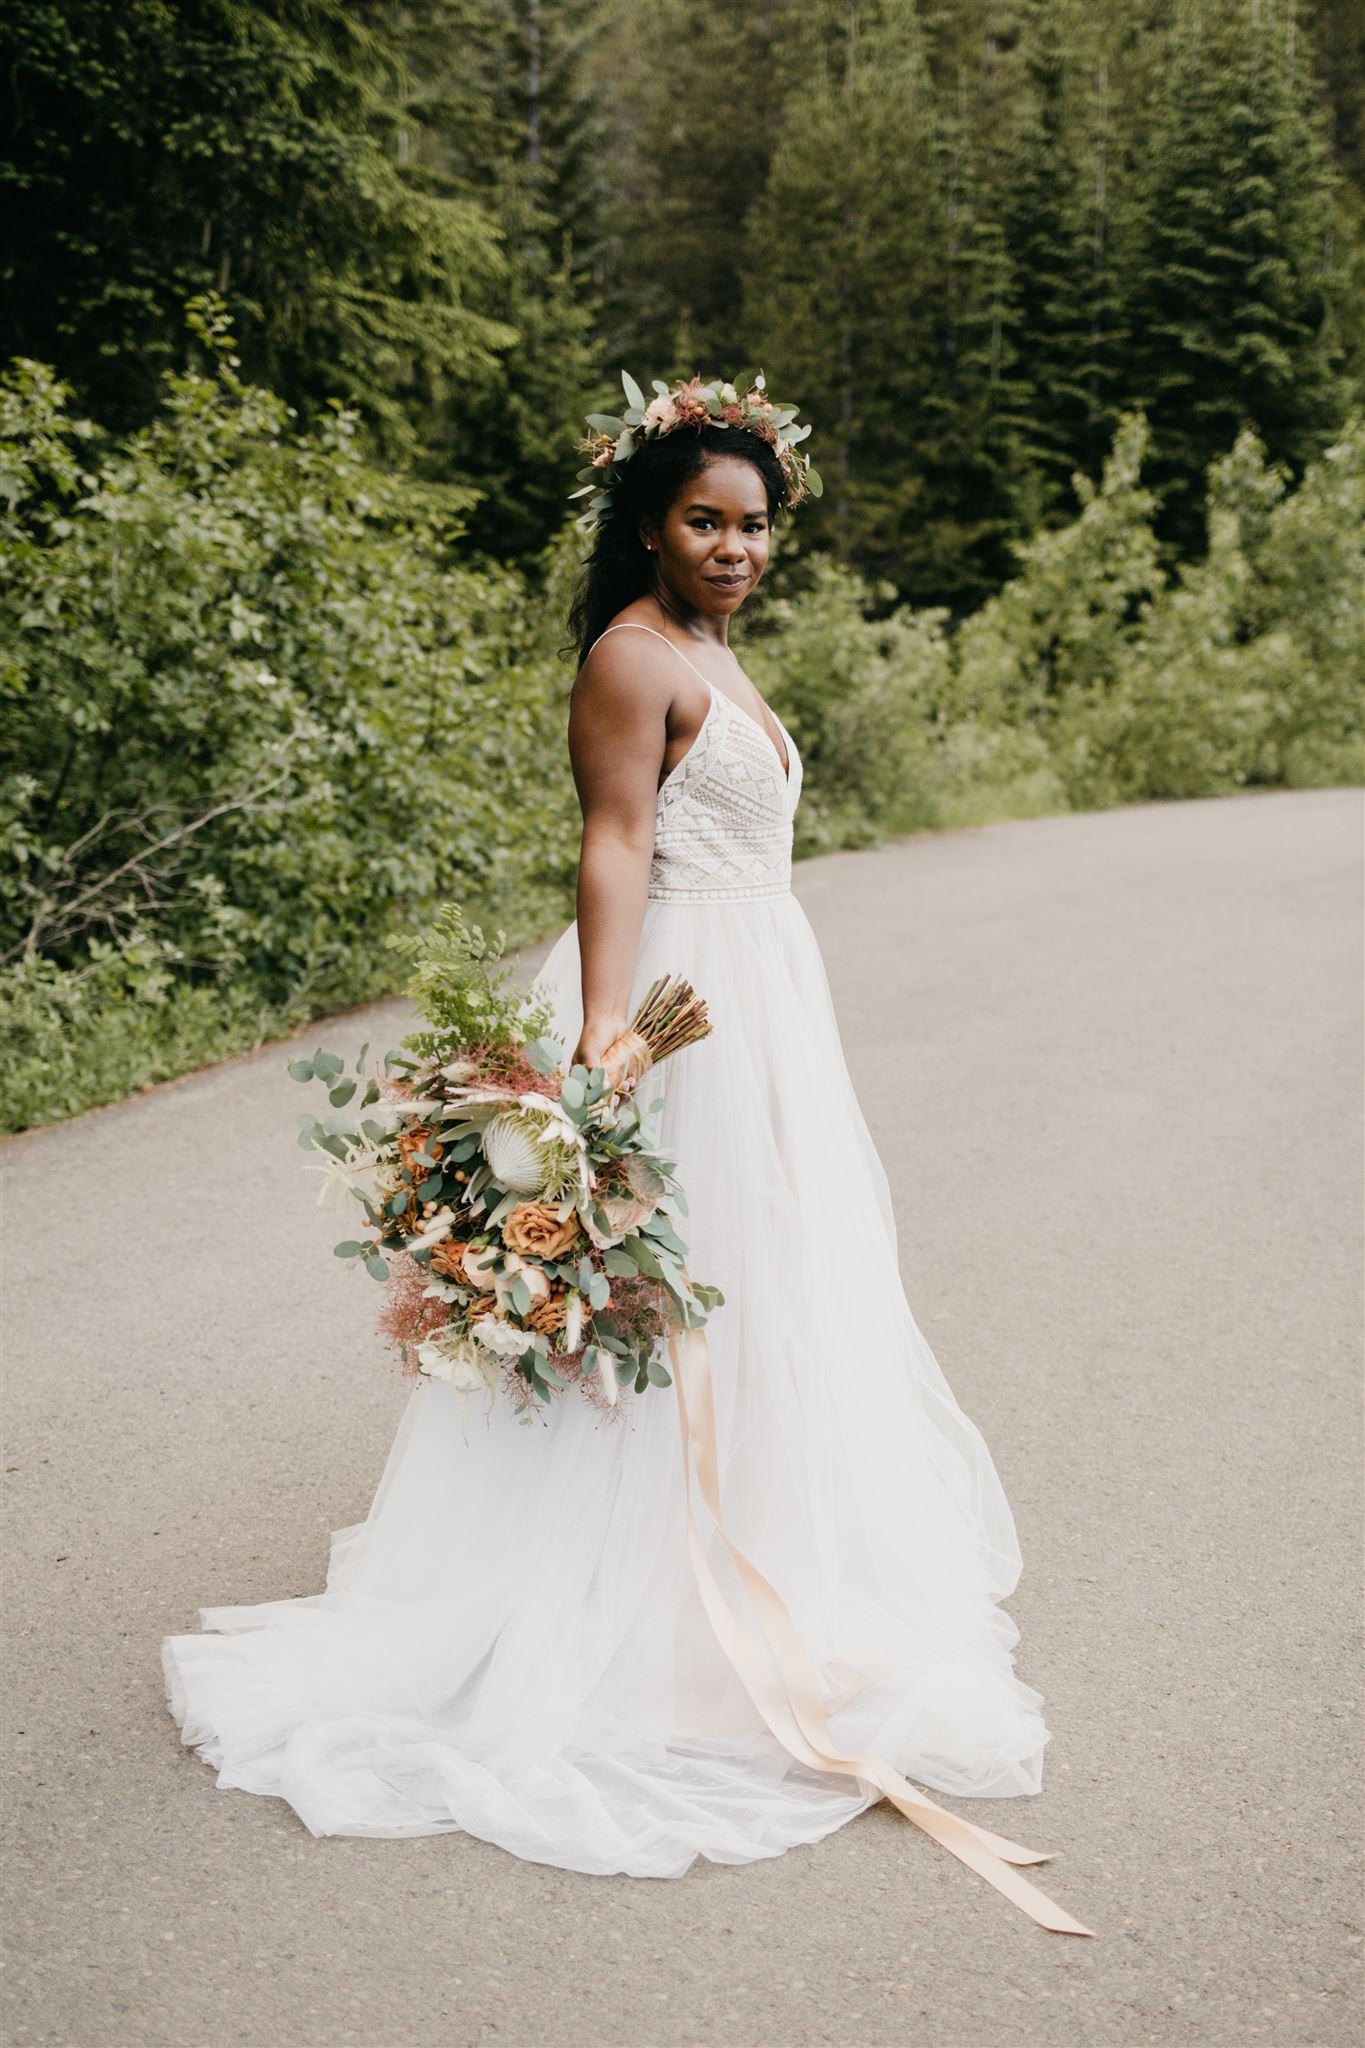 black bride, black beauty, interracial couple, interracial wedding, boho bridal gown, boho flowers, boho bouquet